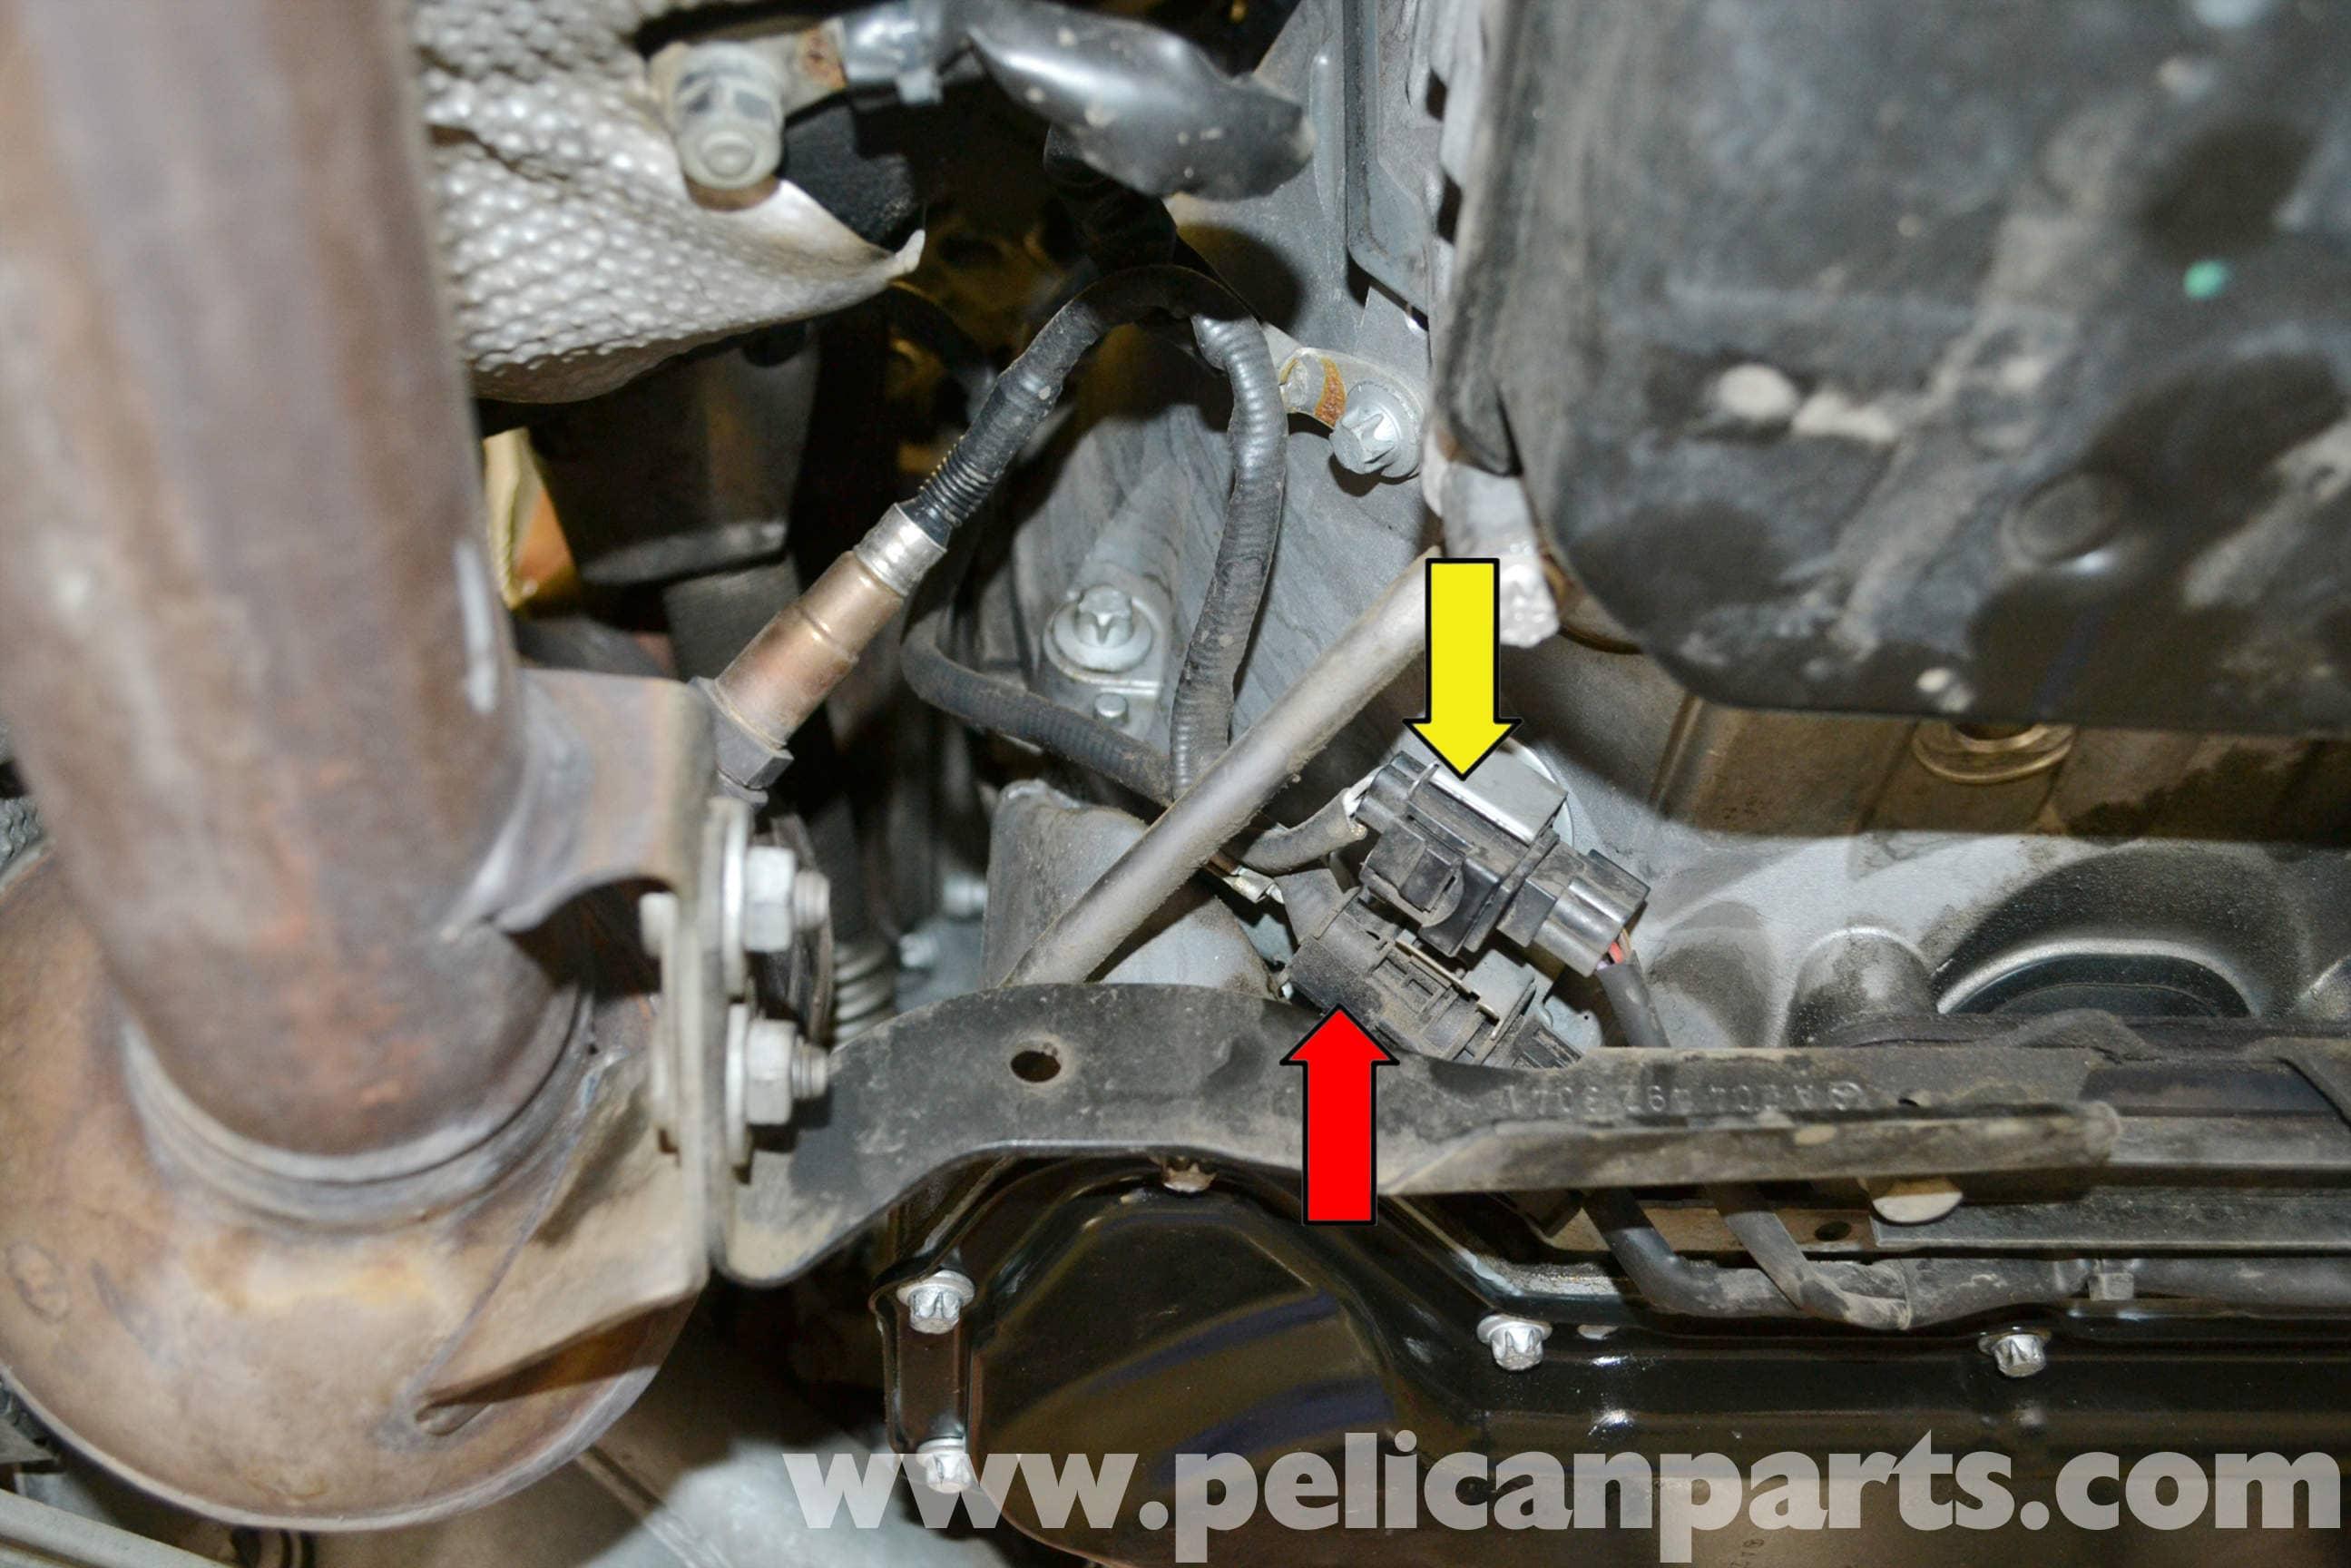 Mercedes-benz W204 Oxygen Sensor Replacement